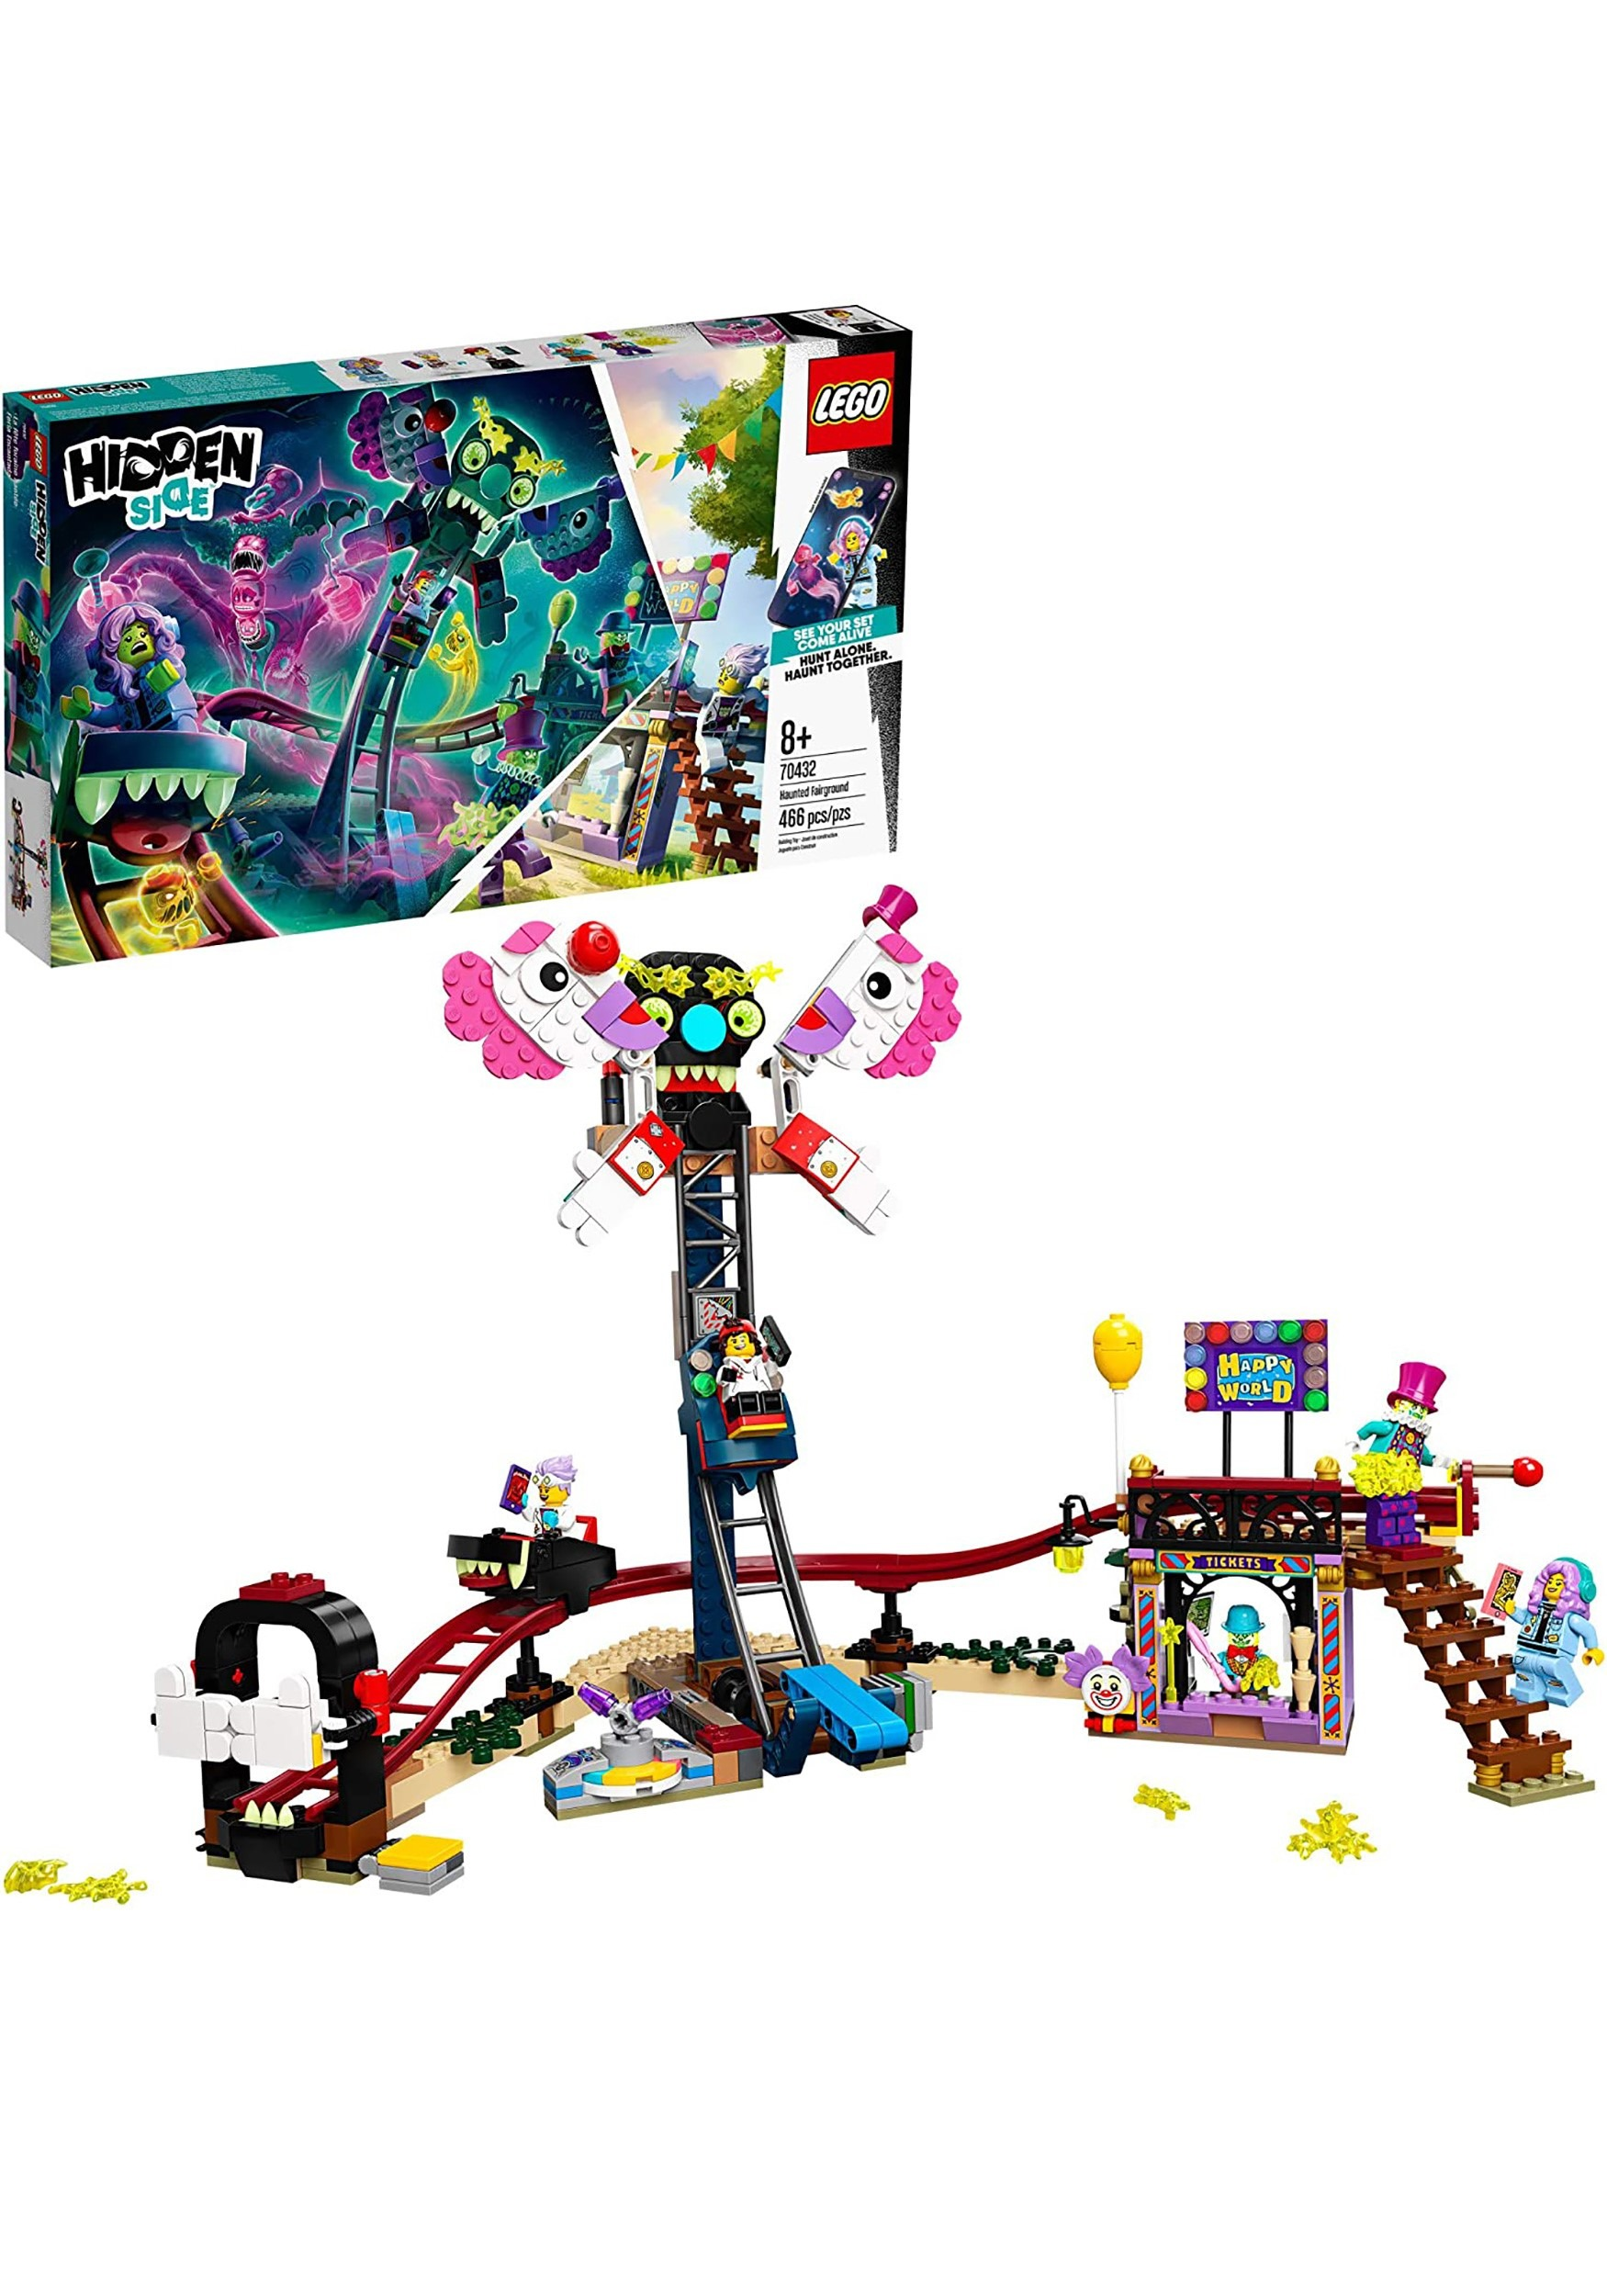 LEGO Hidden Side Haunted Fairground Building Set